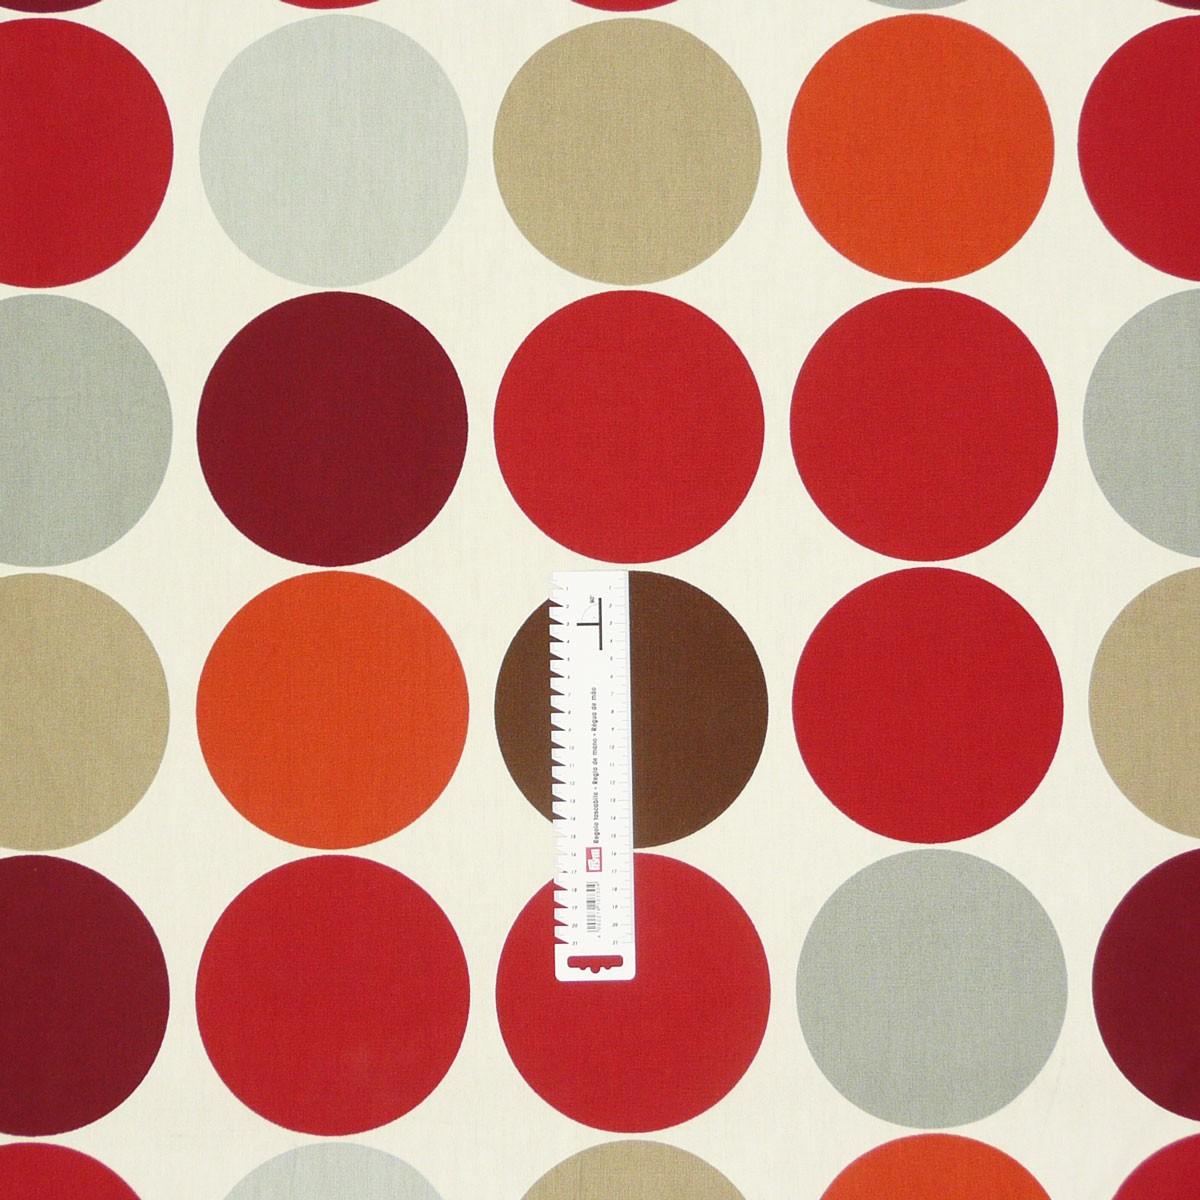 baumwollstoff kreise grau rot gardinenstoff dekostoff stoffe stoffe gemustert stoff punkte. Black Bedroom Furniture Sets. Home Design Ideas